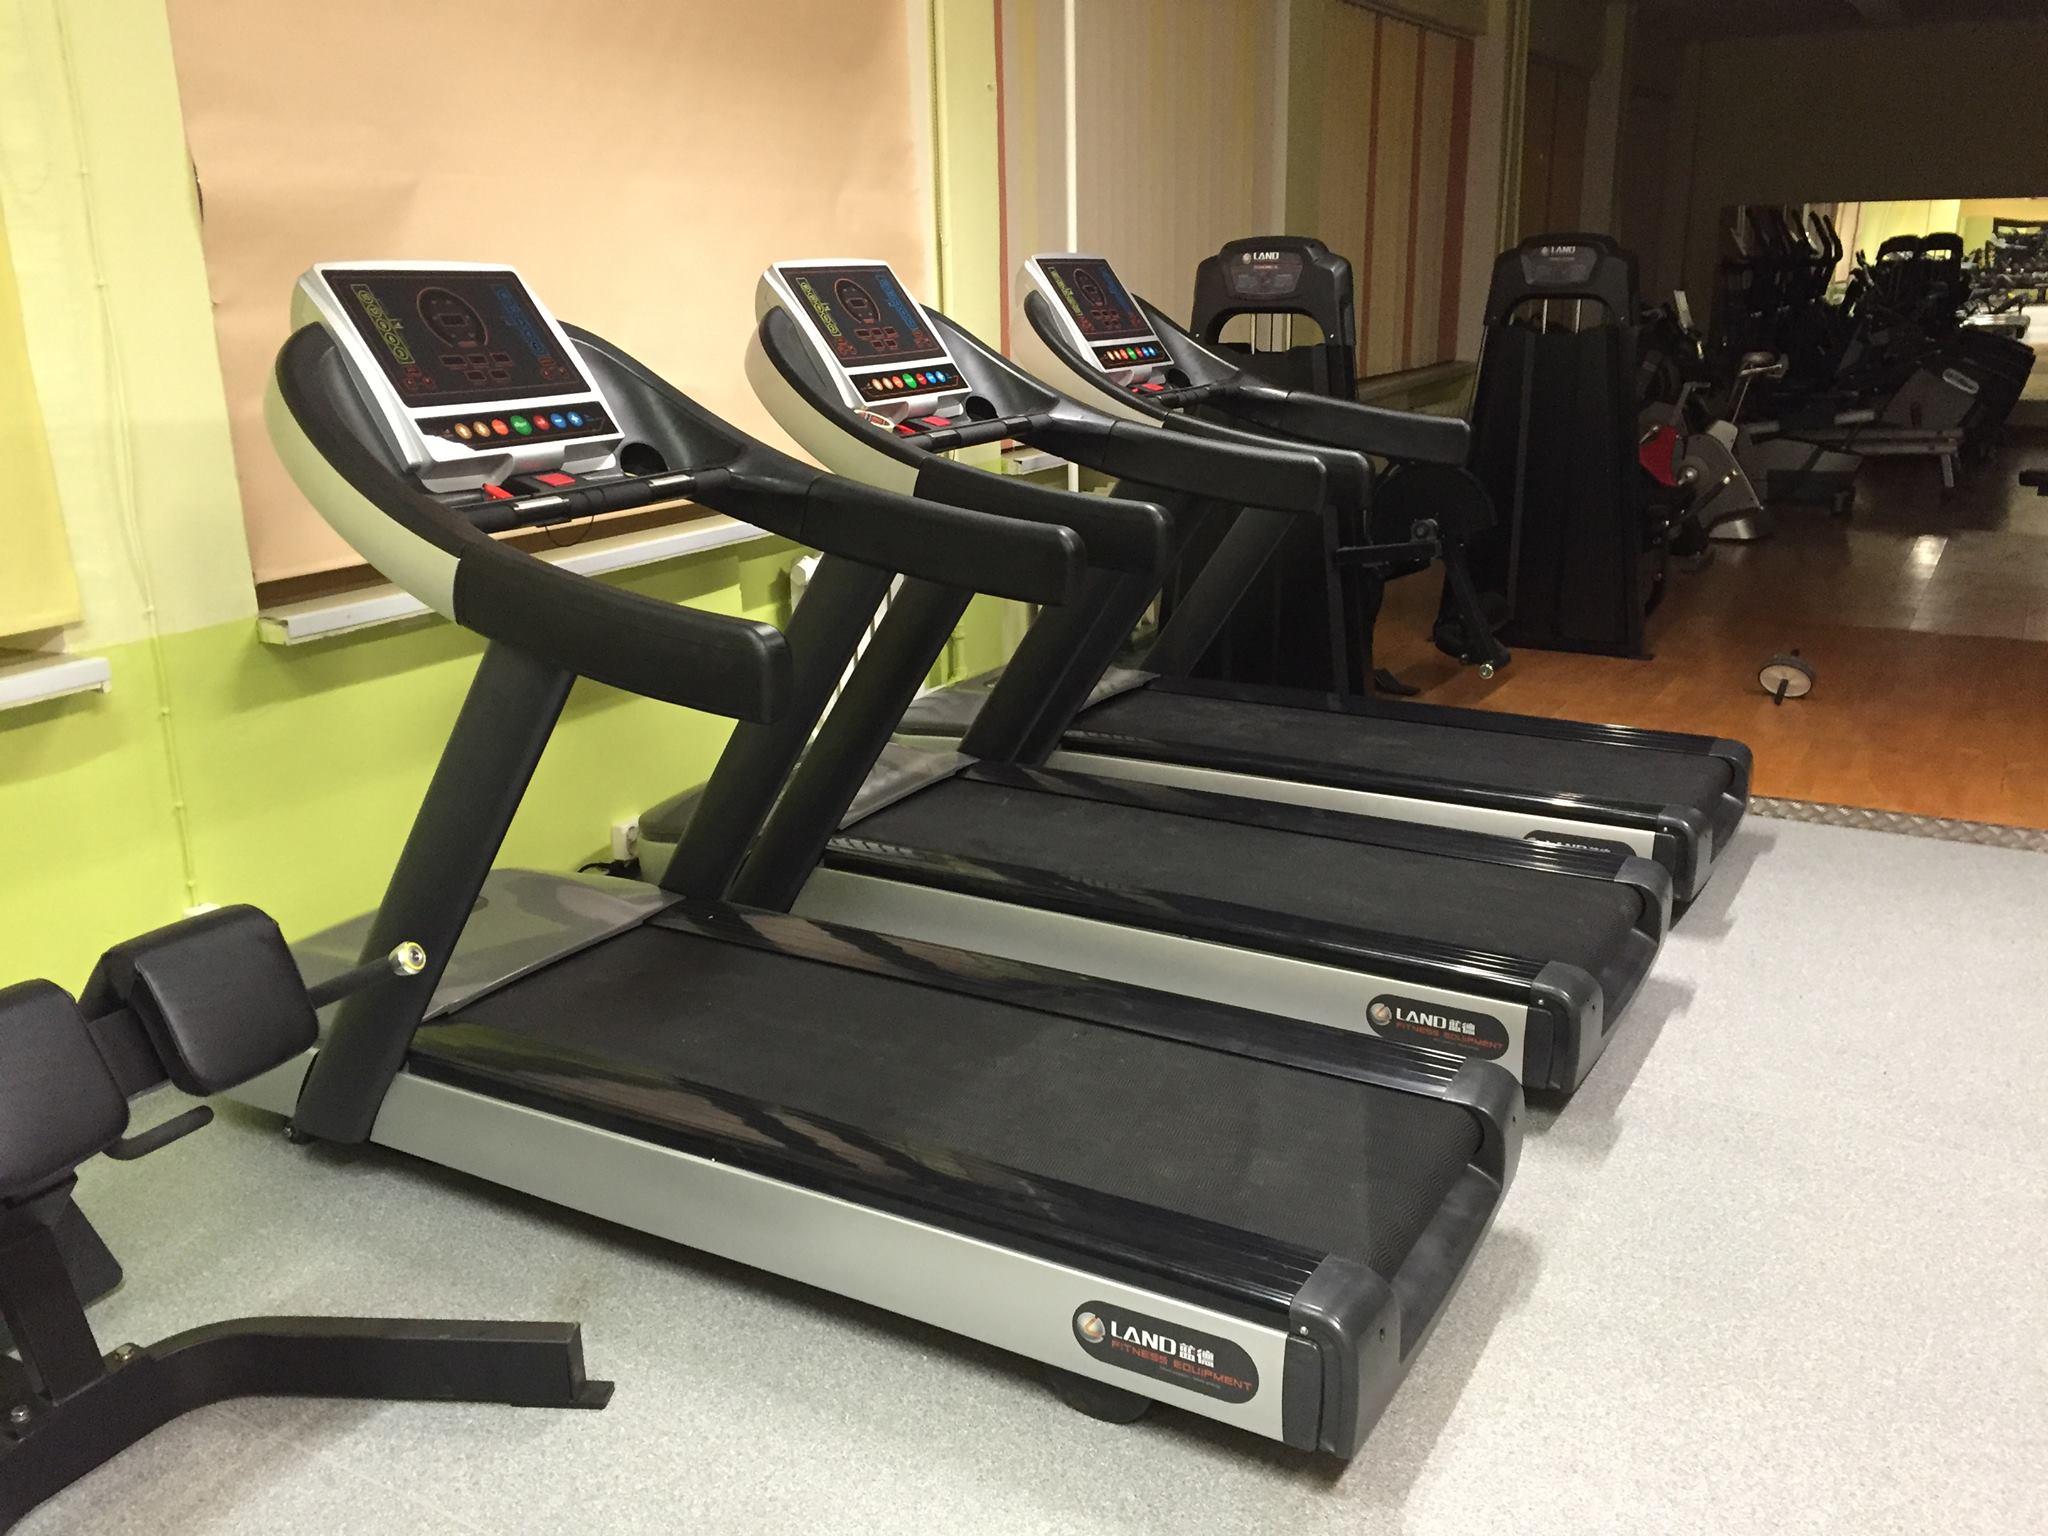 df12e278248 1 Jooksulint Land Fitness LDT-1800B